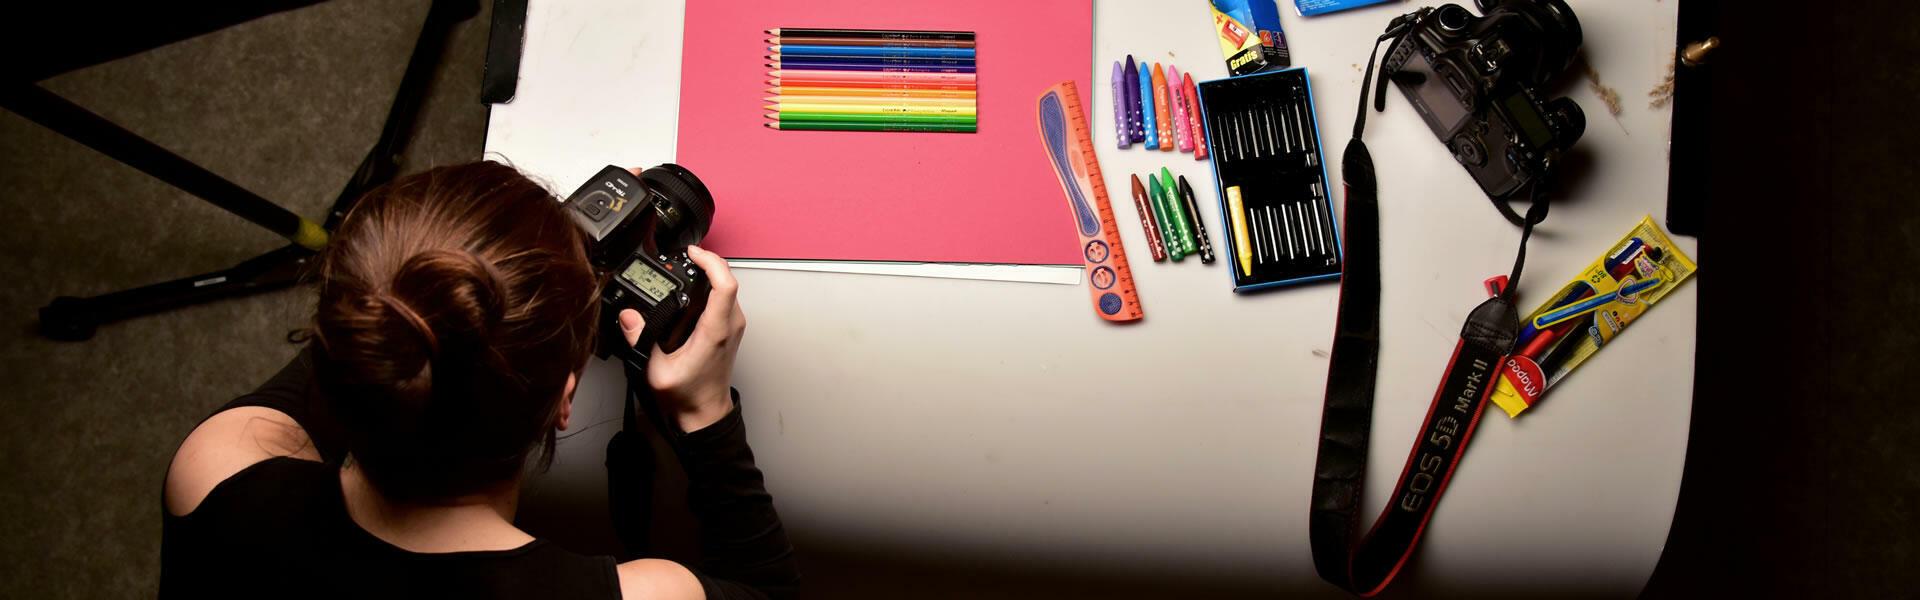 Fotografická tvorba